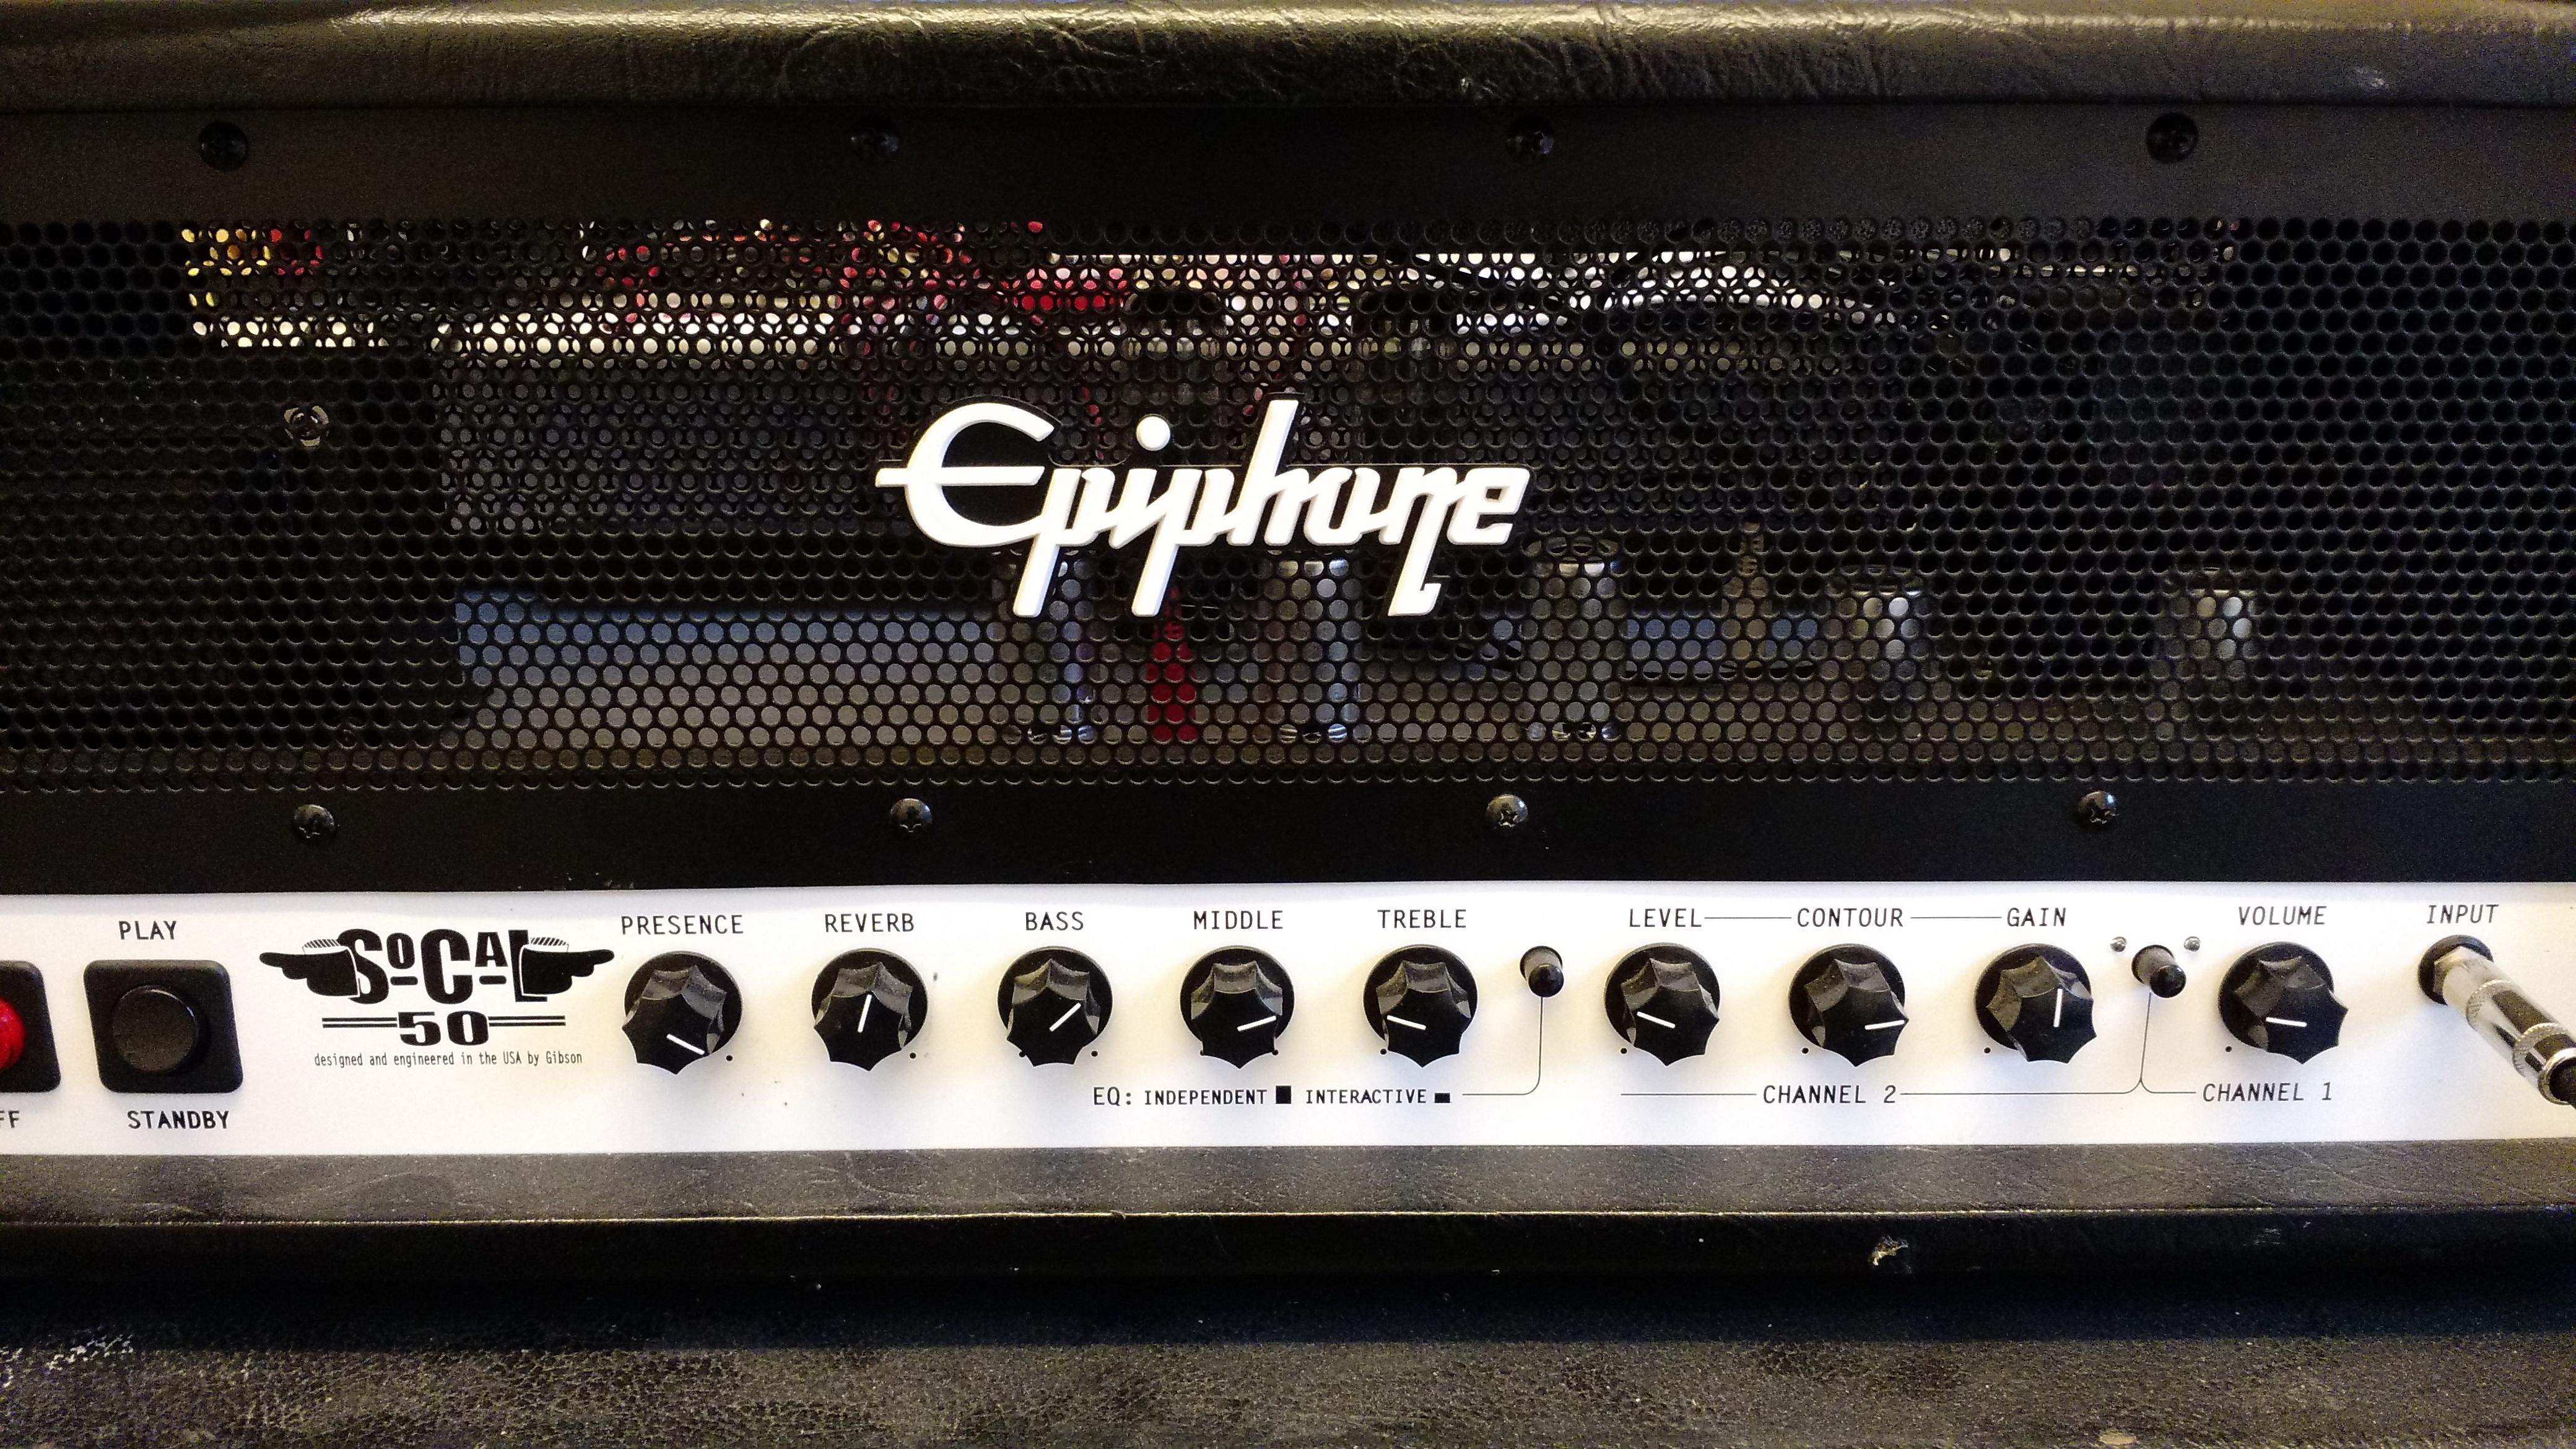 Epiphone SoCal50 50W valve amp plus Fender 4x12 speaker cab-socal50_front.jpg